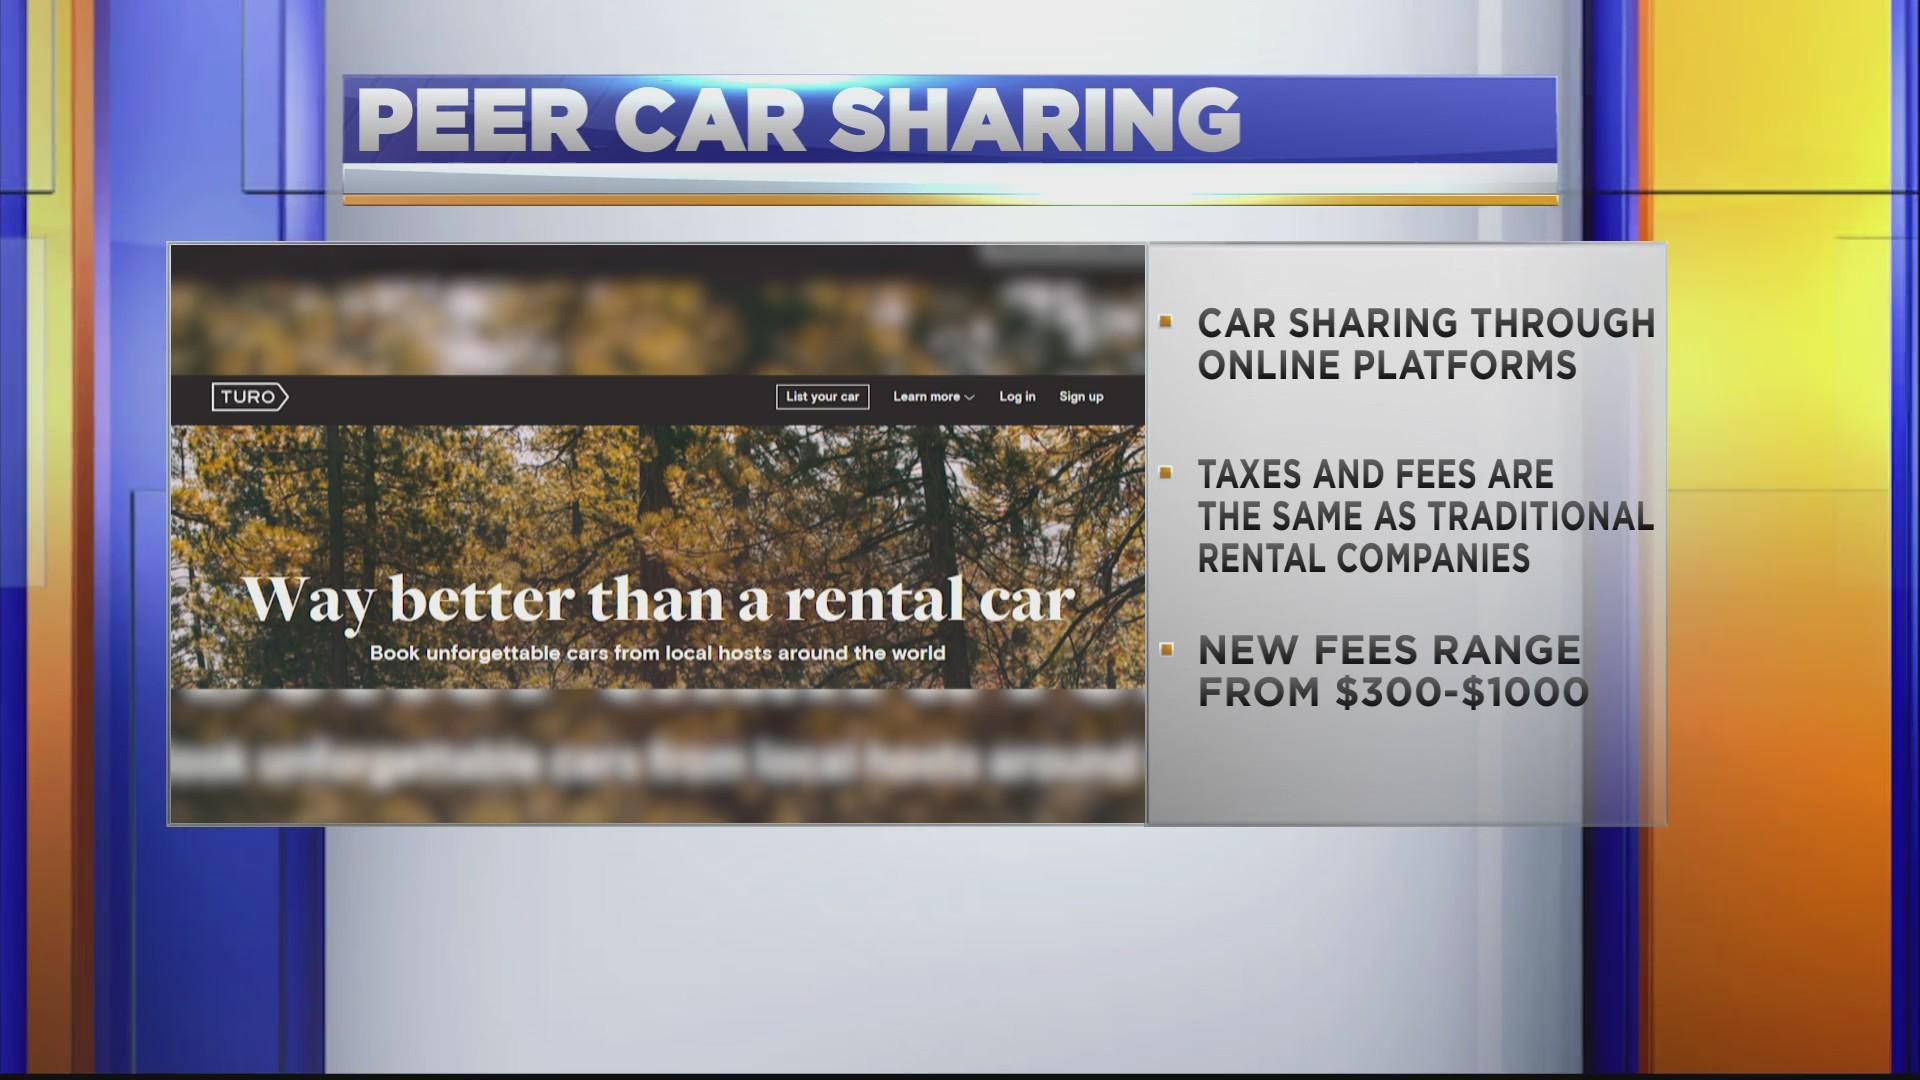 Peer_car_sharing_0_20190103222037